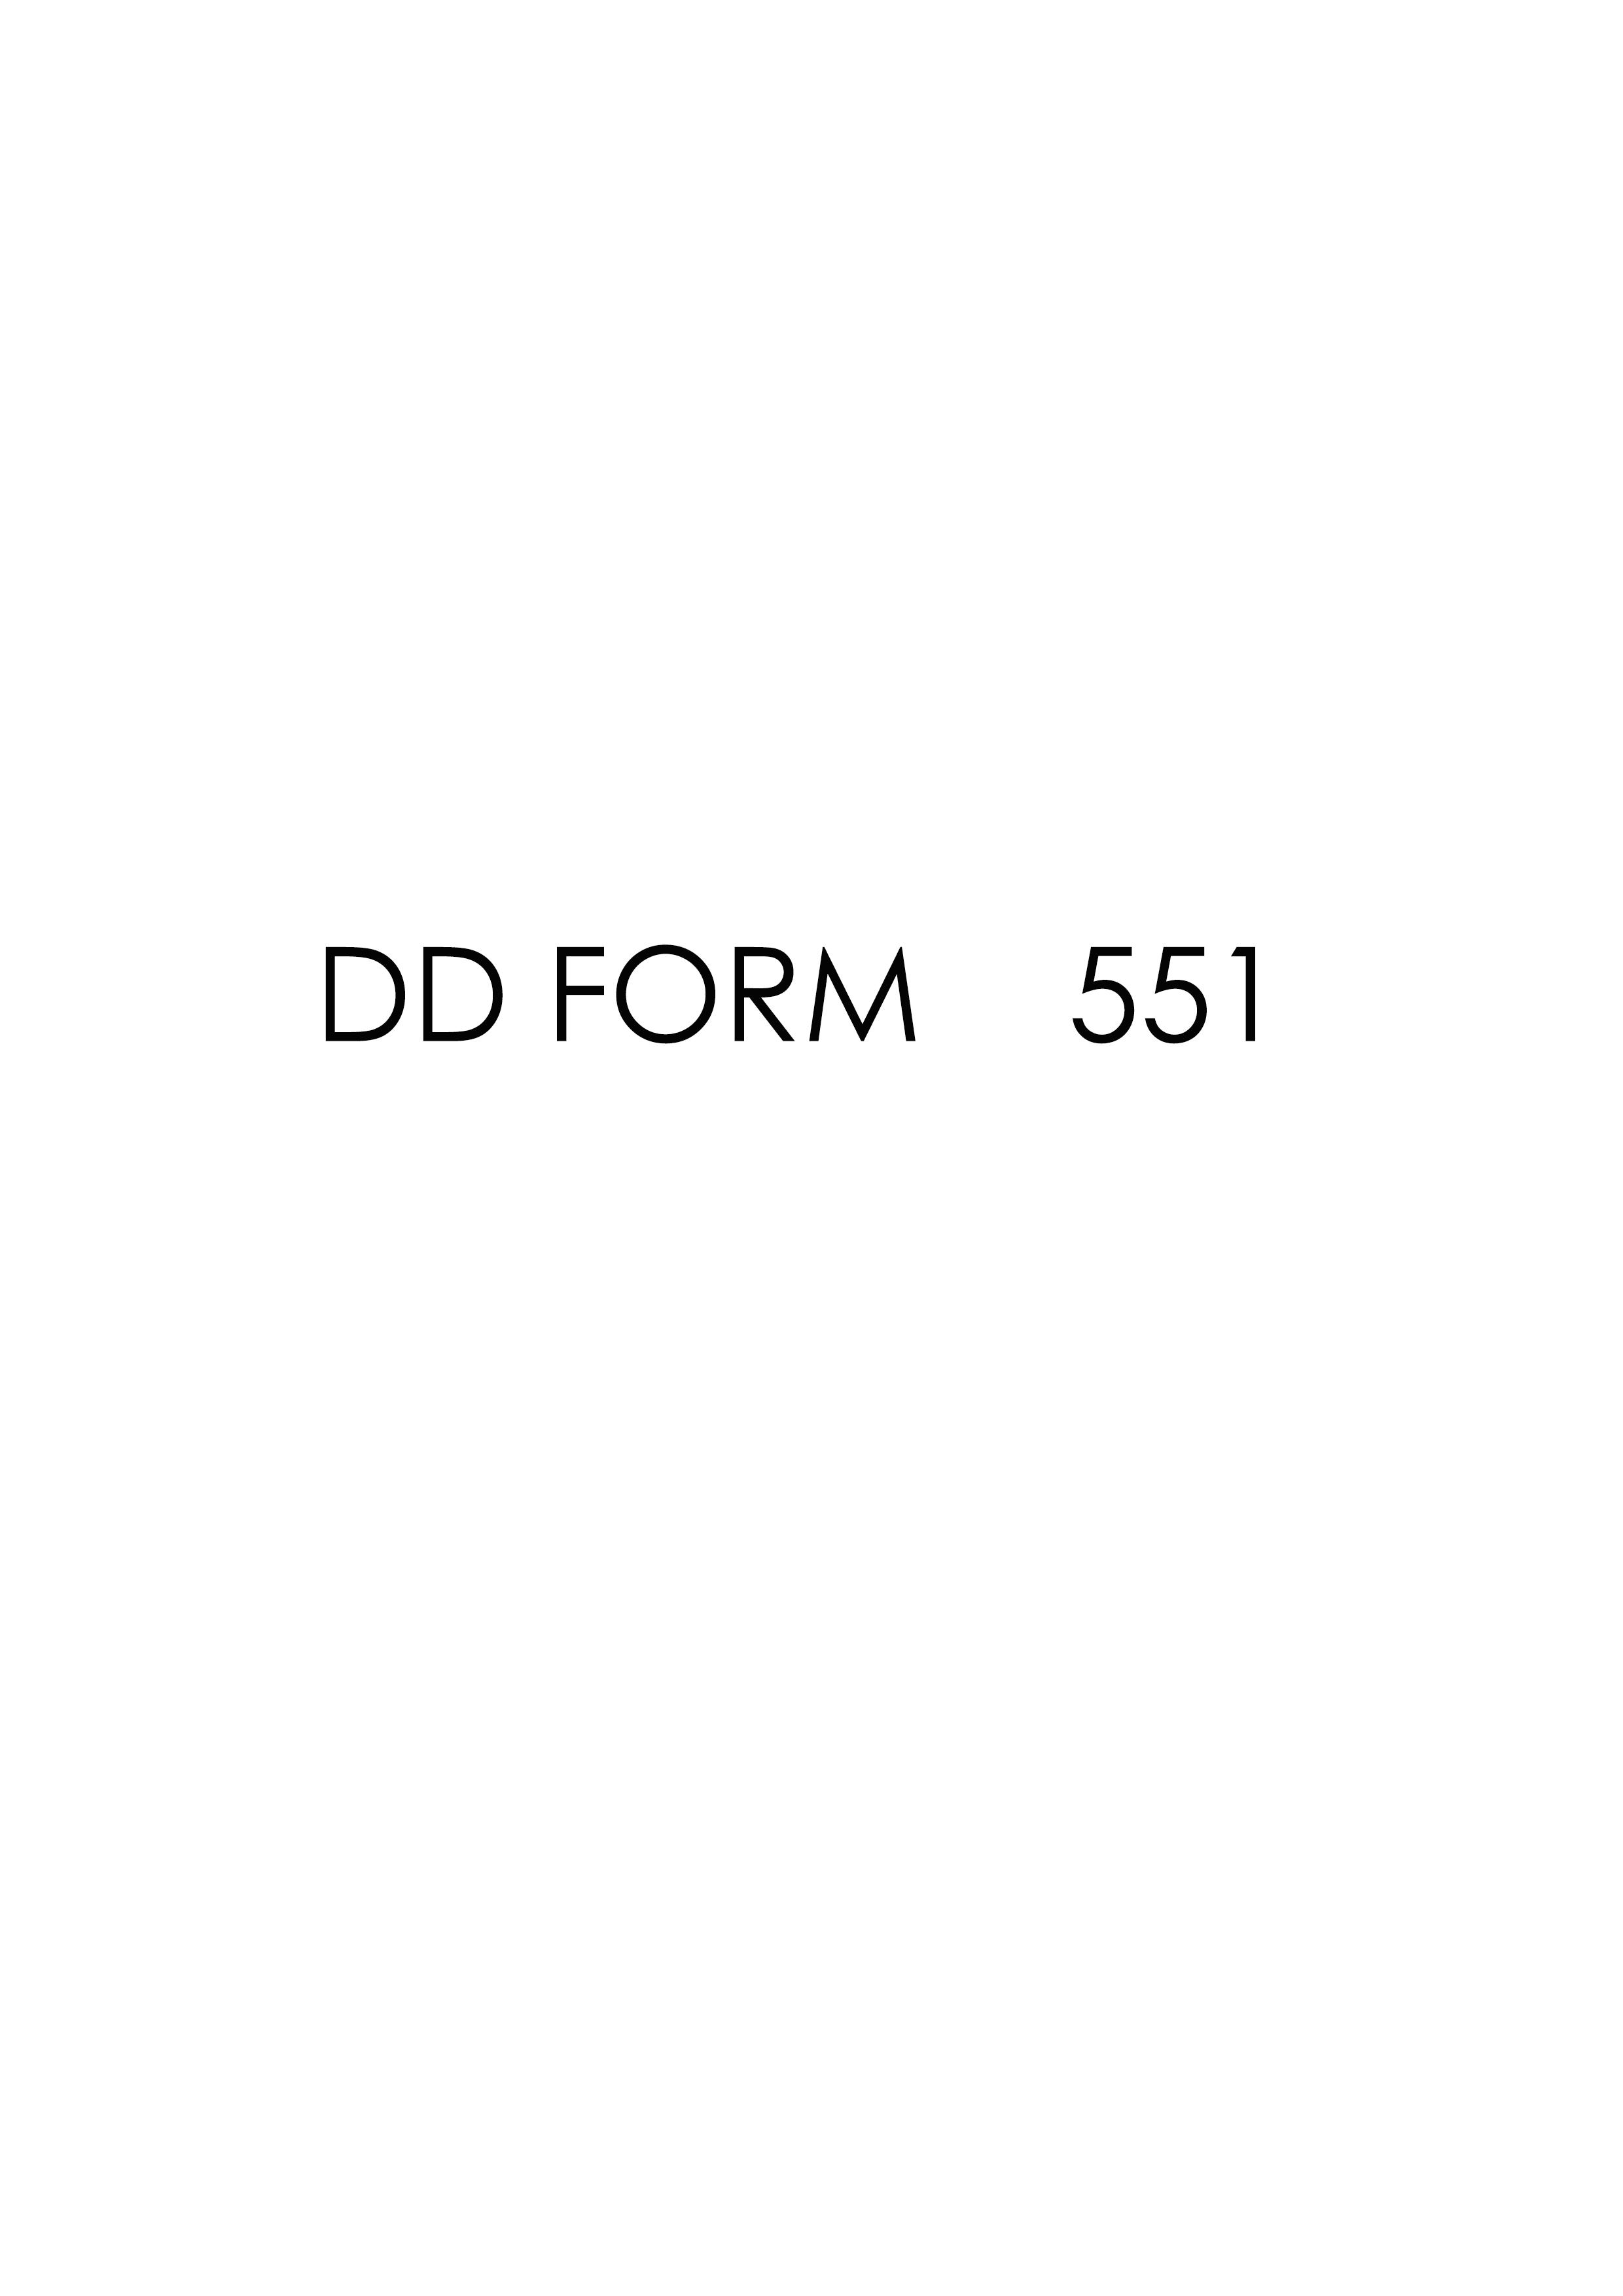 Download dd Form 551 Free